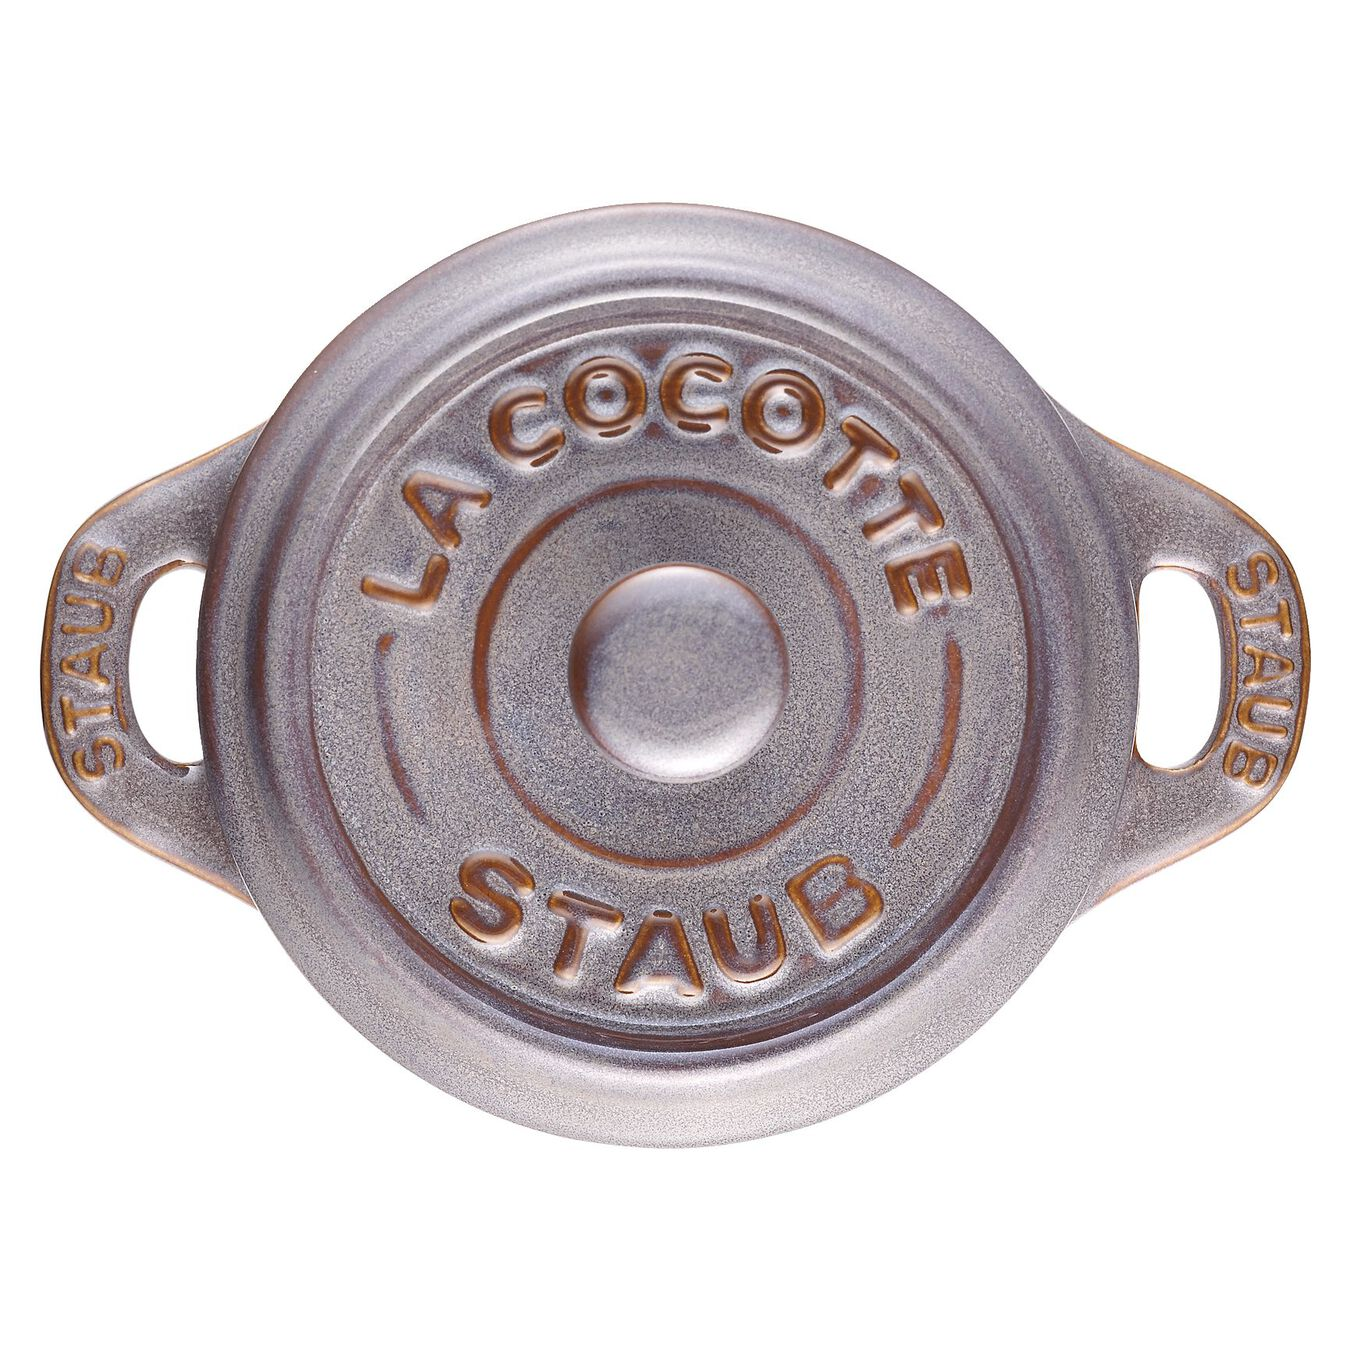 Mini Cocotte 10 cm, redondo, Cinza antigo, Cerâmica,,large 4